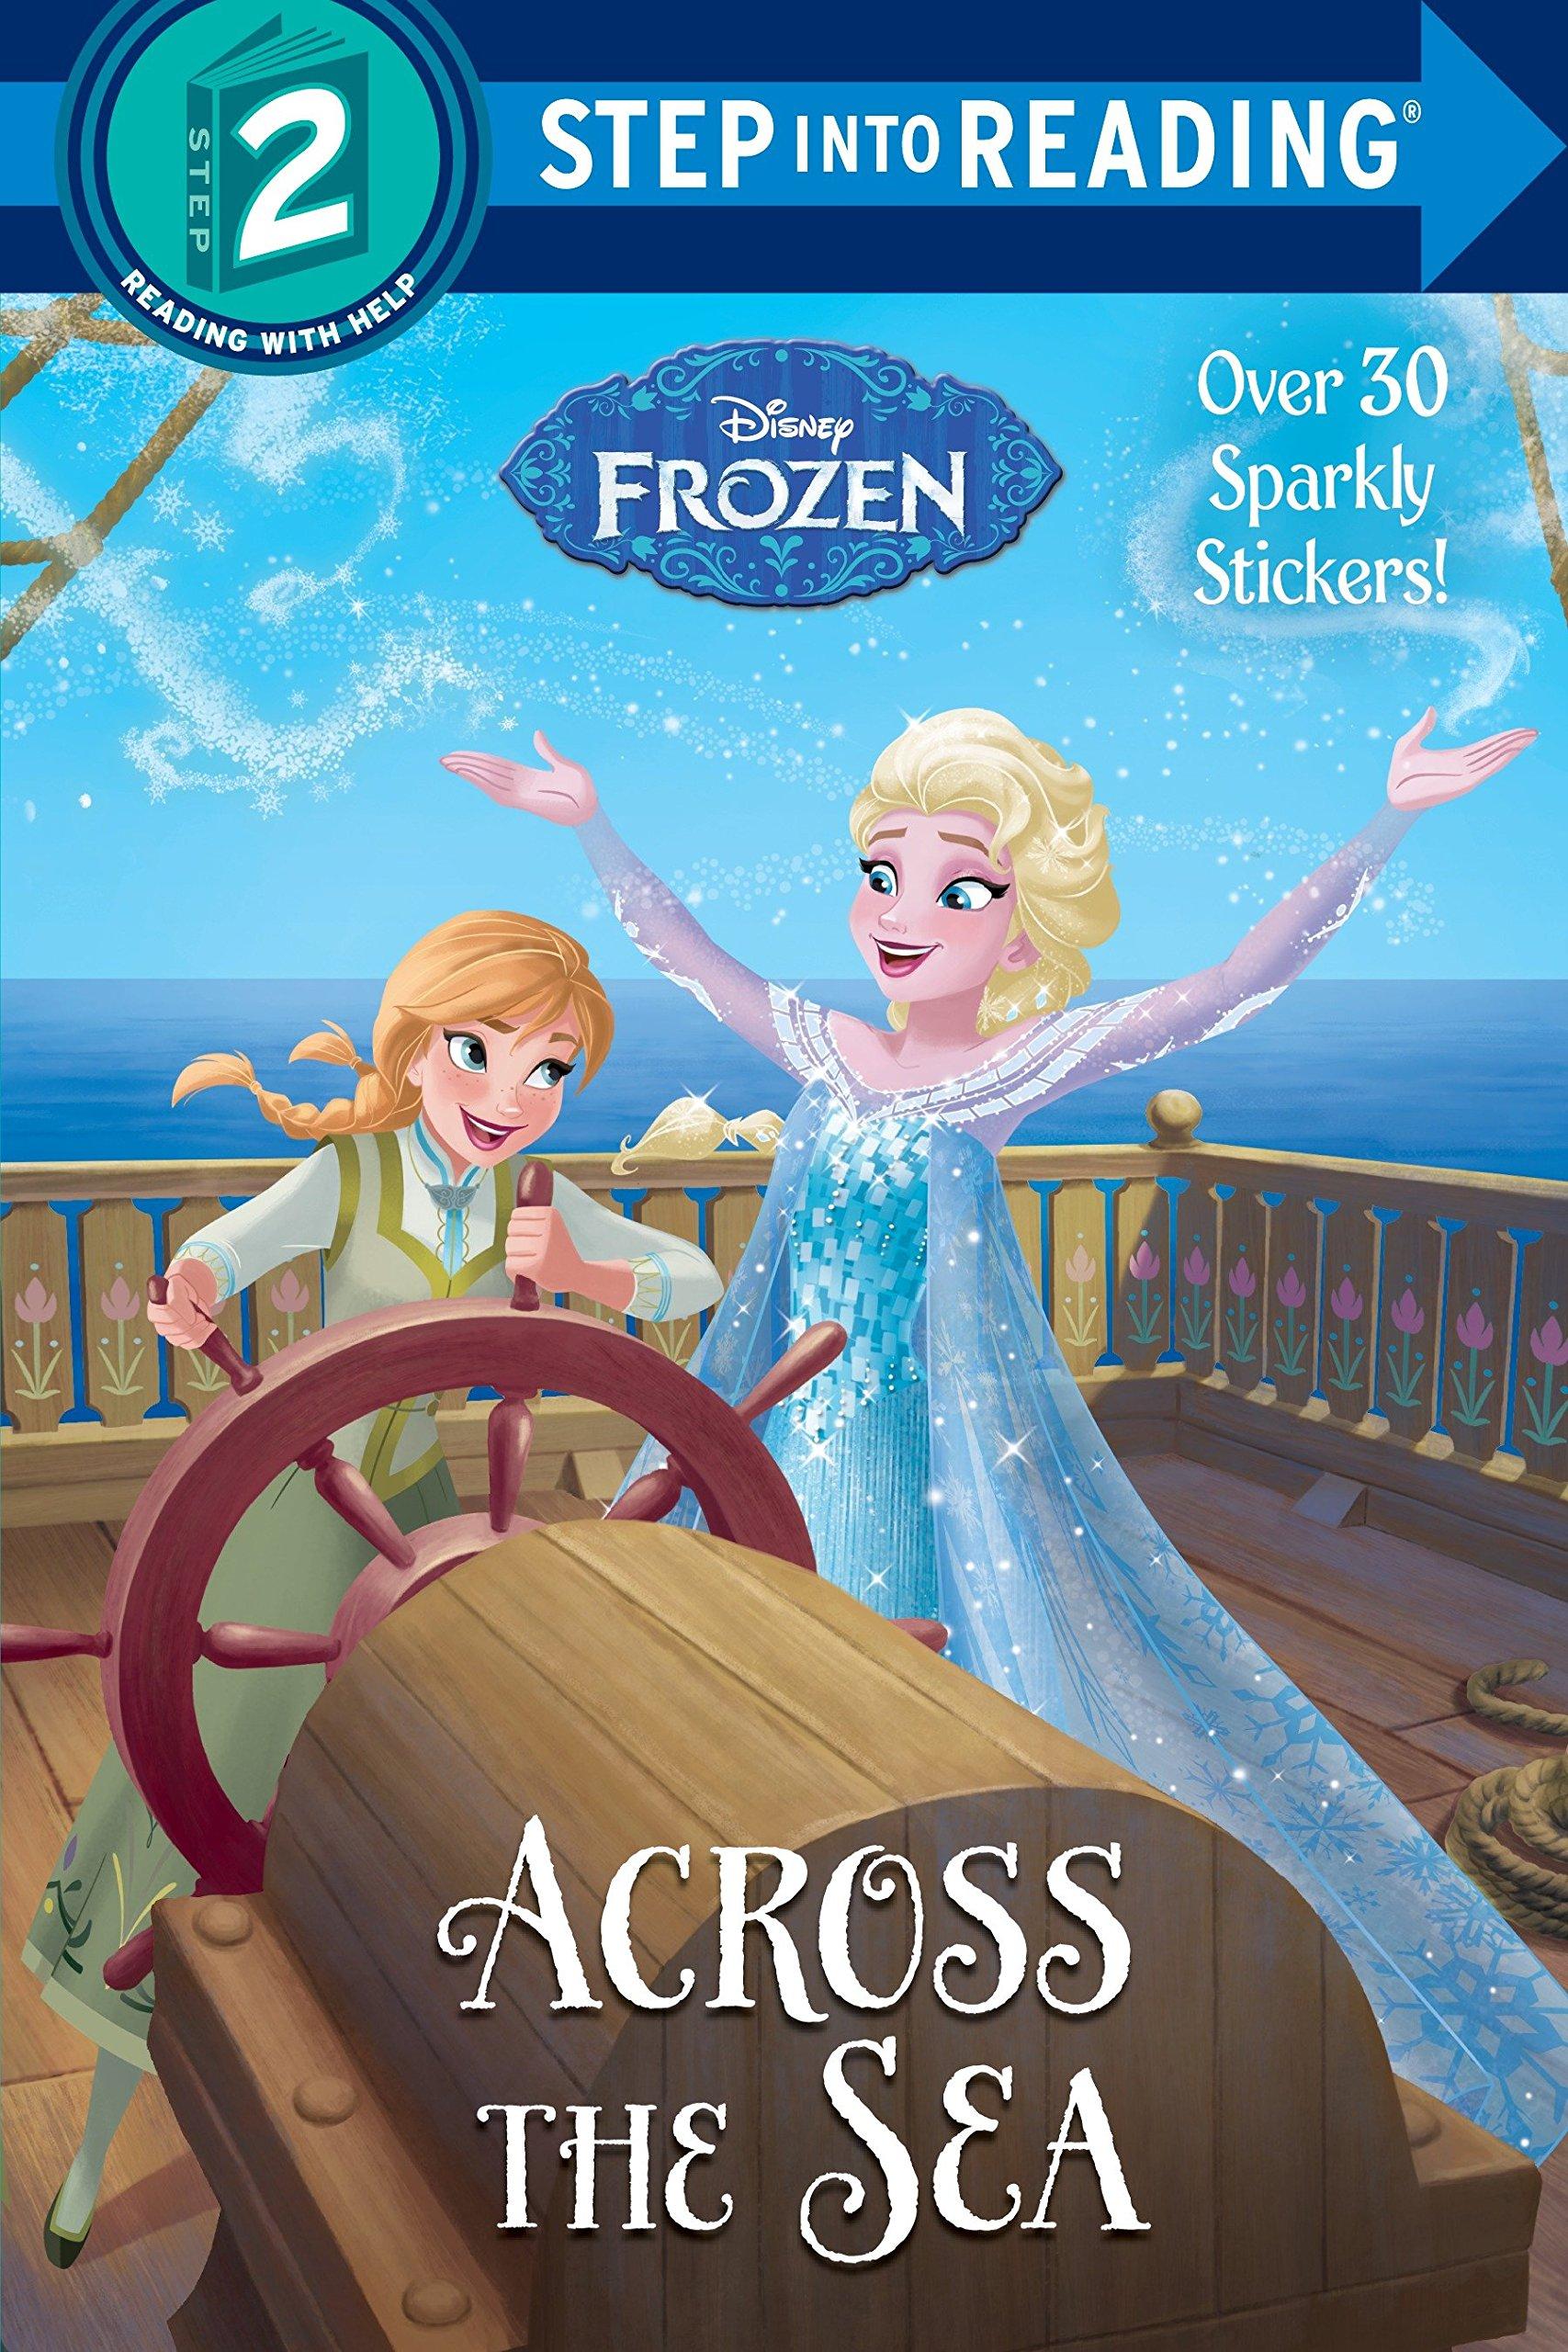 Amazon.com: Across the Sea (Disney Frozen) (Step into Reading ...